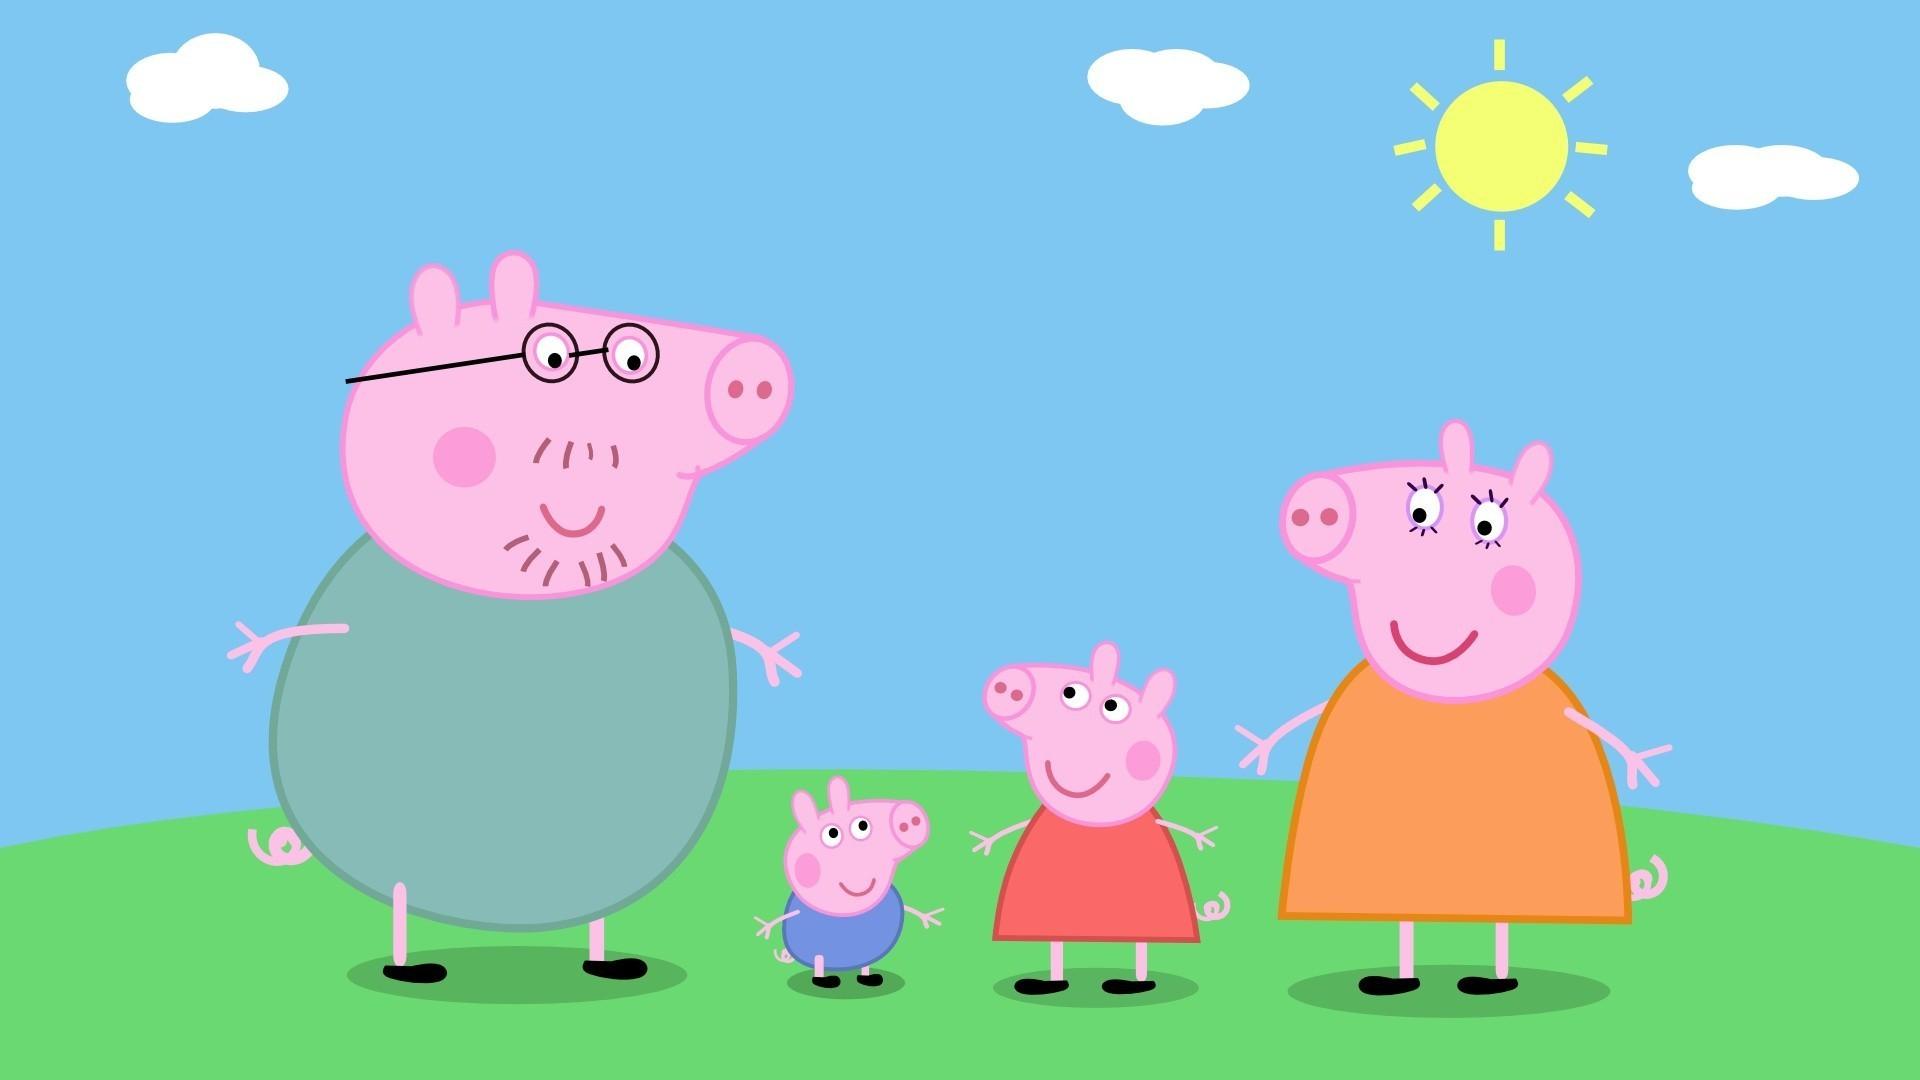 … Peppa Pig, Around the World picture …